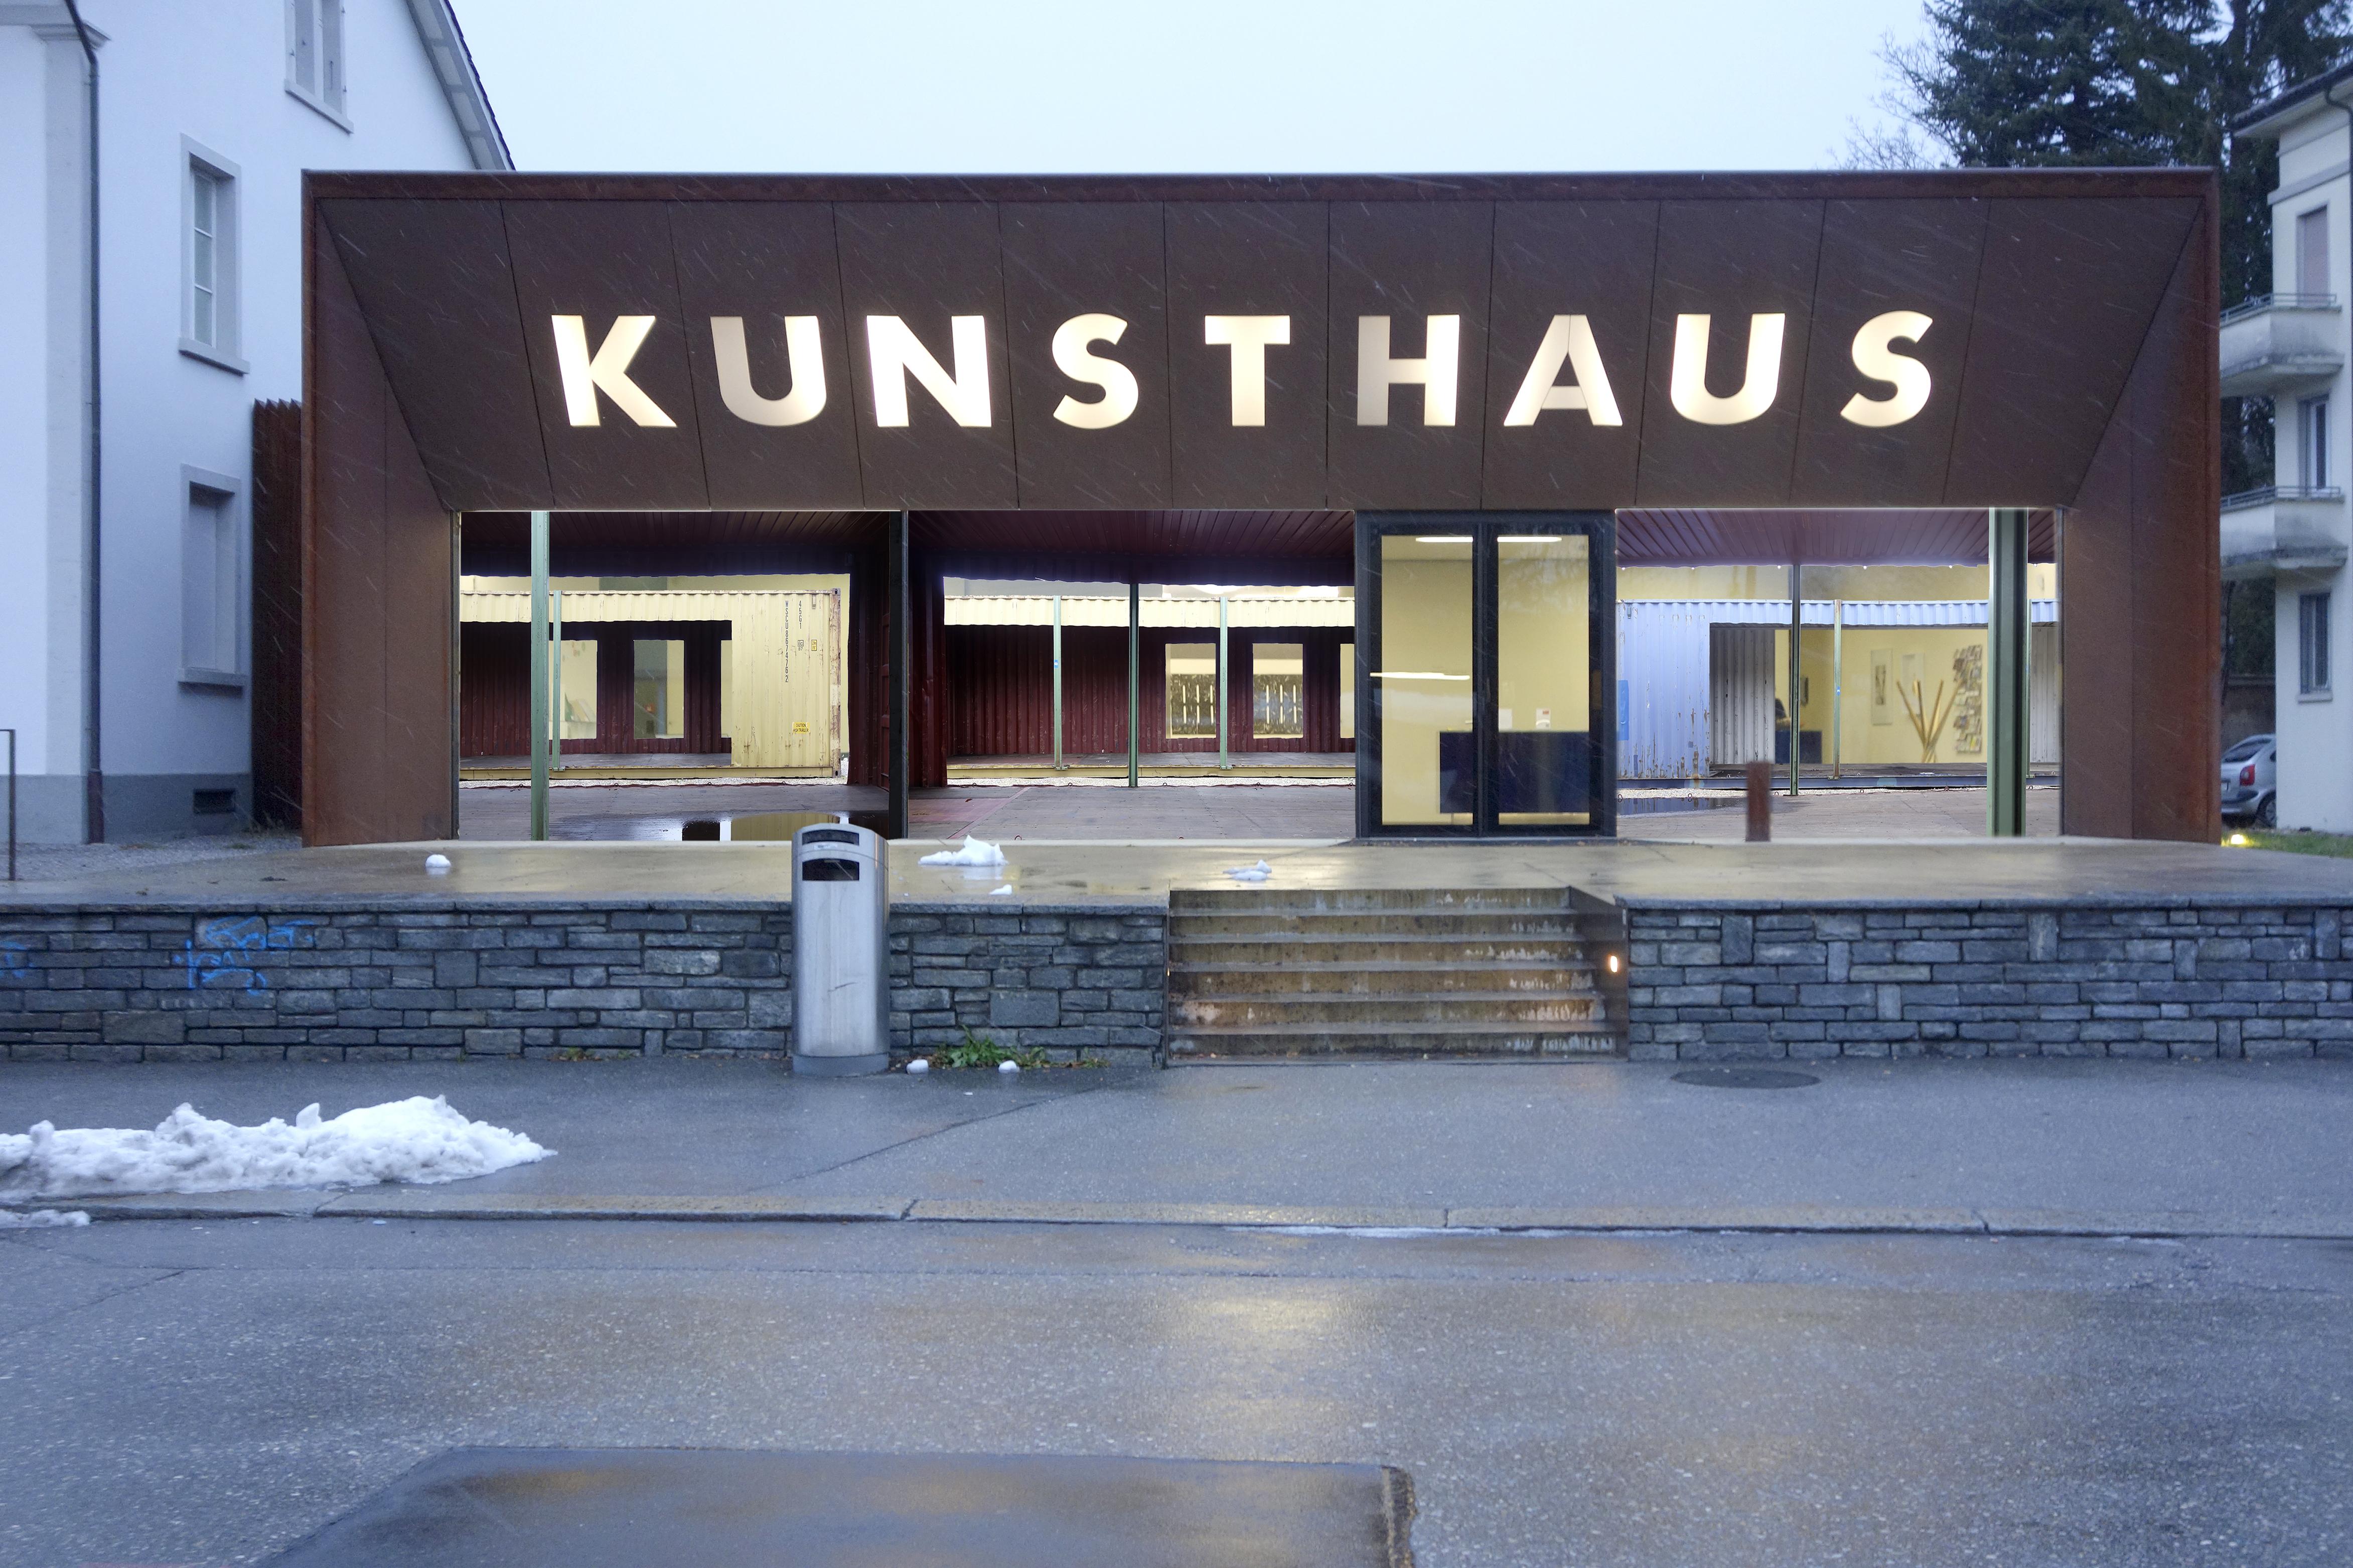 Thomas-Woodtli_Buehne-frei-fuers-Museum_2018_Aussenansicht_(c)Woodtli